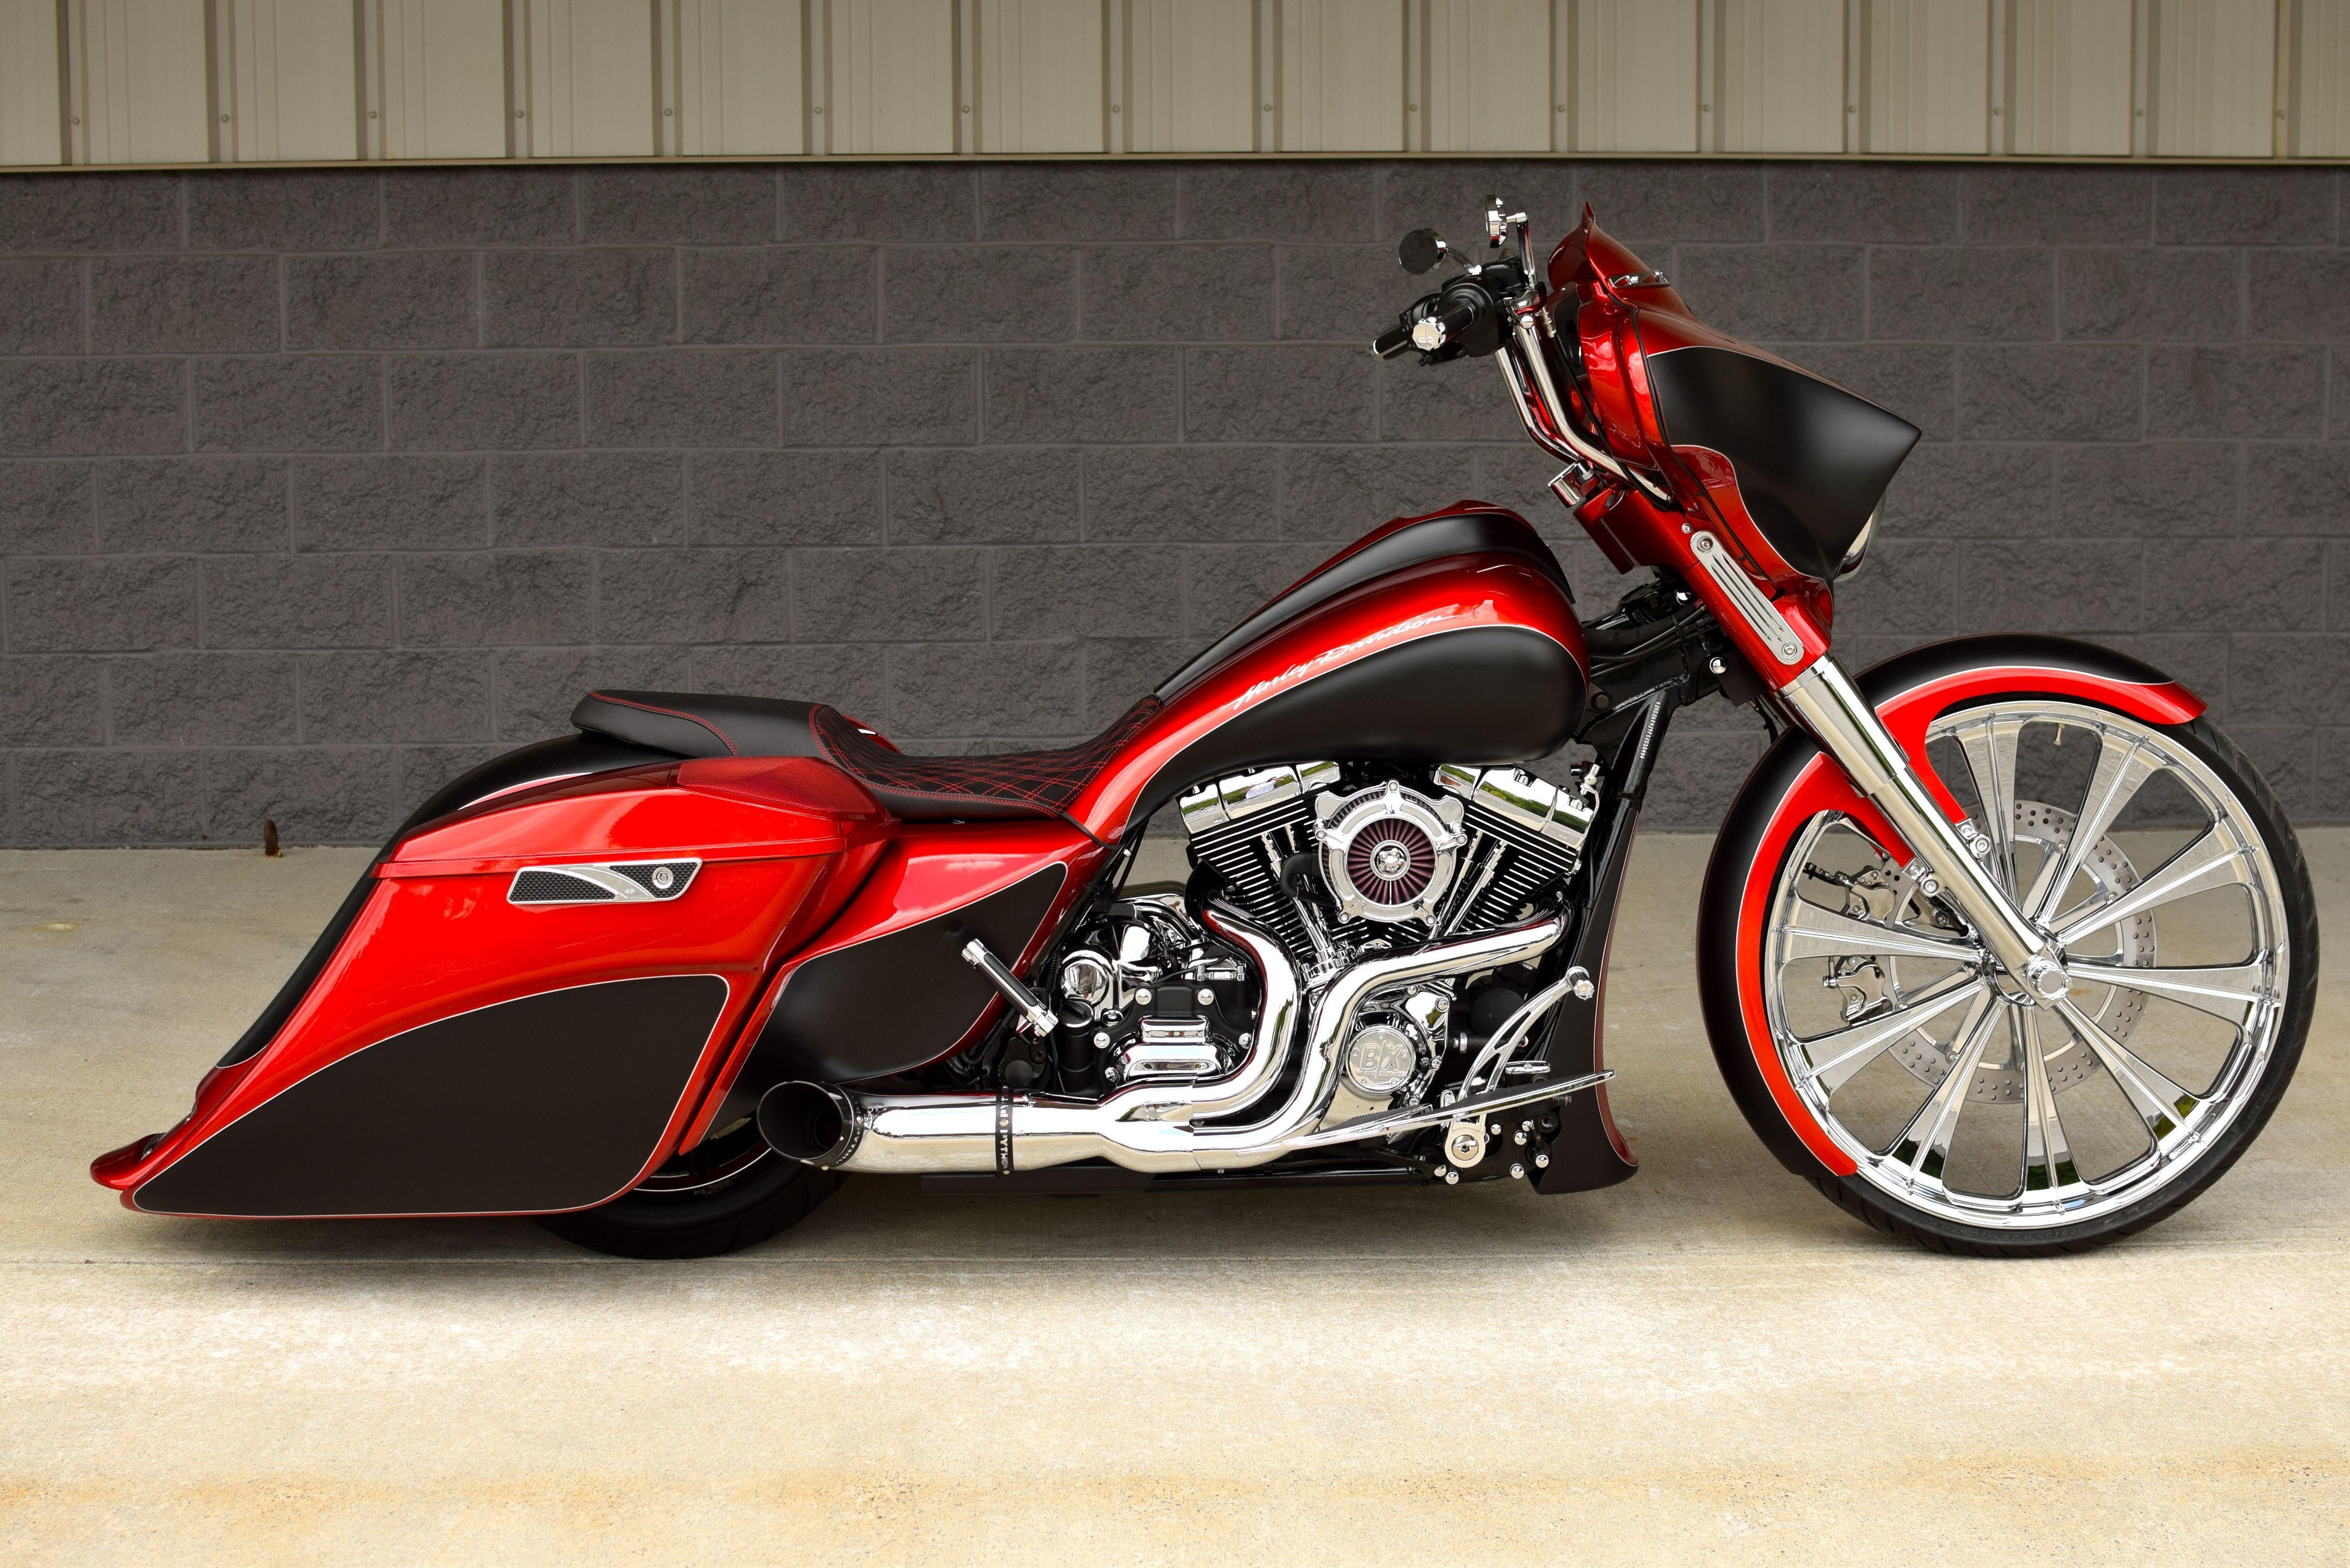 22+ Pictures of Motorcycle Harley Davidson Street Glide | Vintage ...